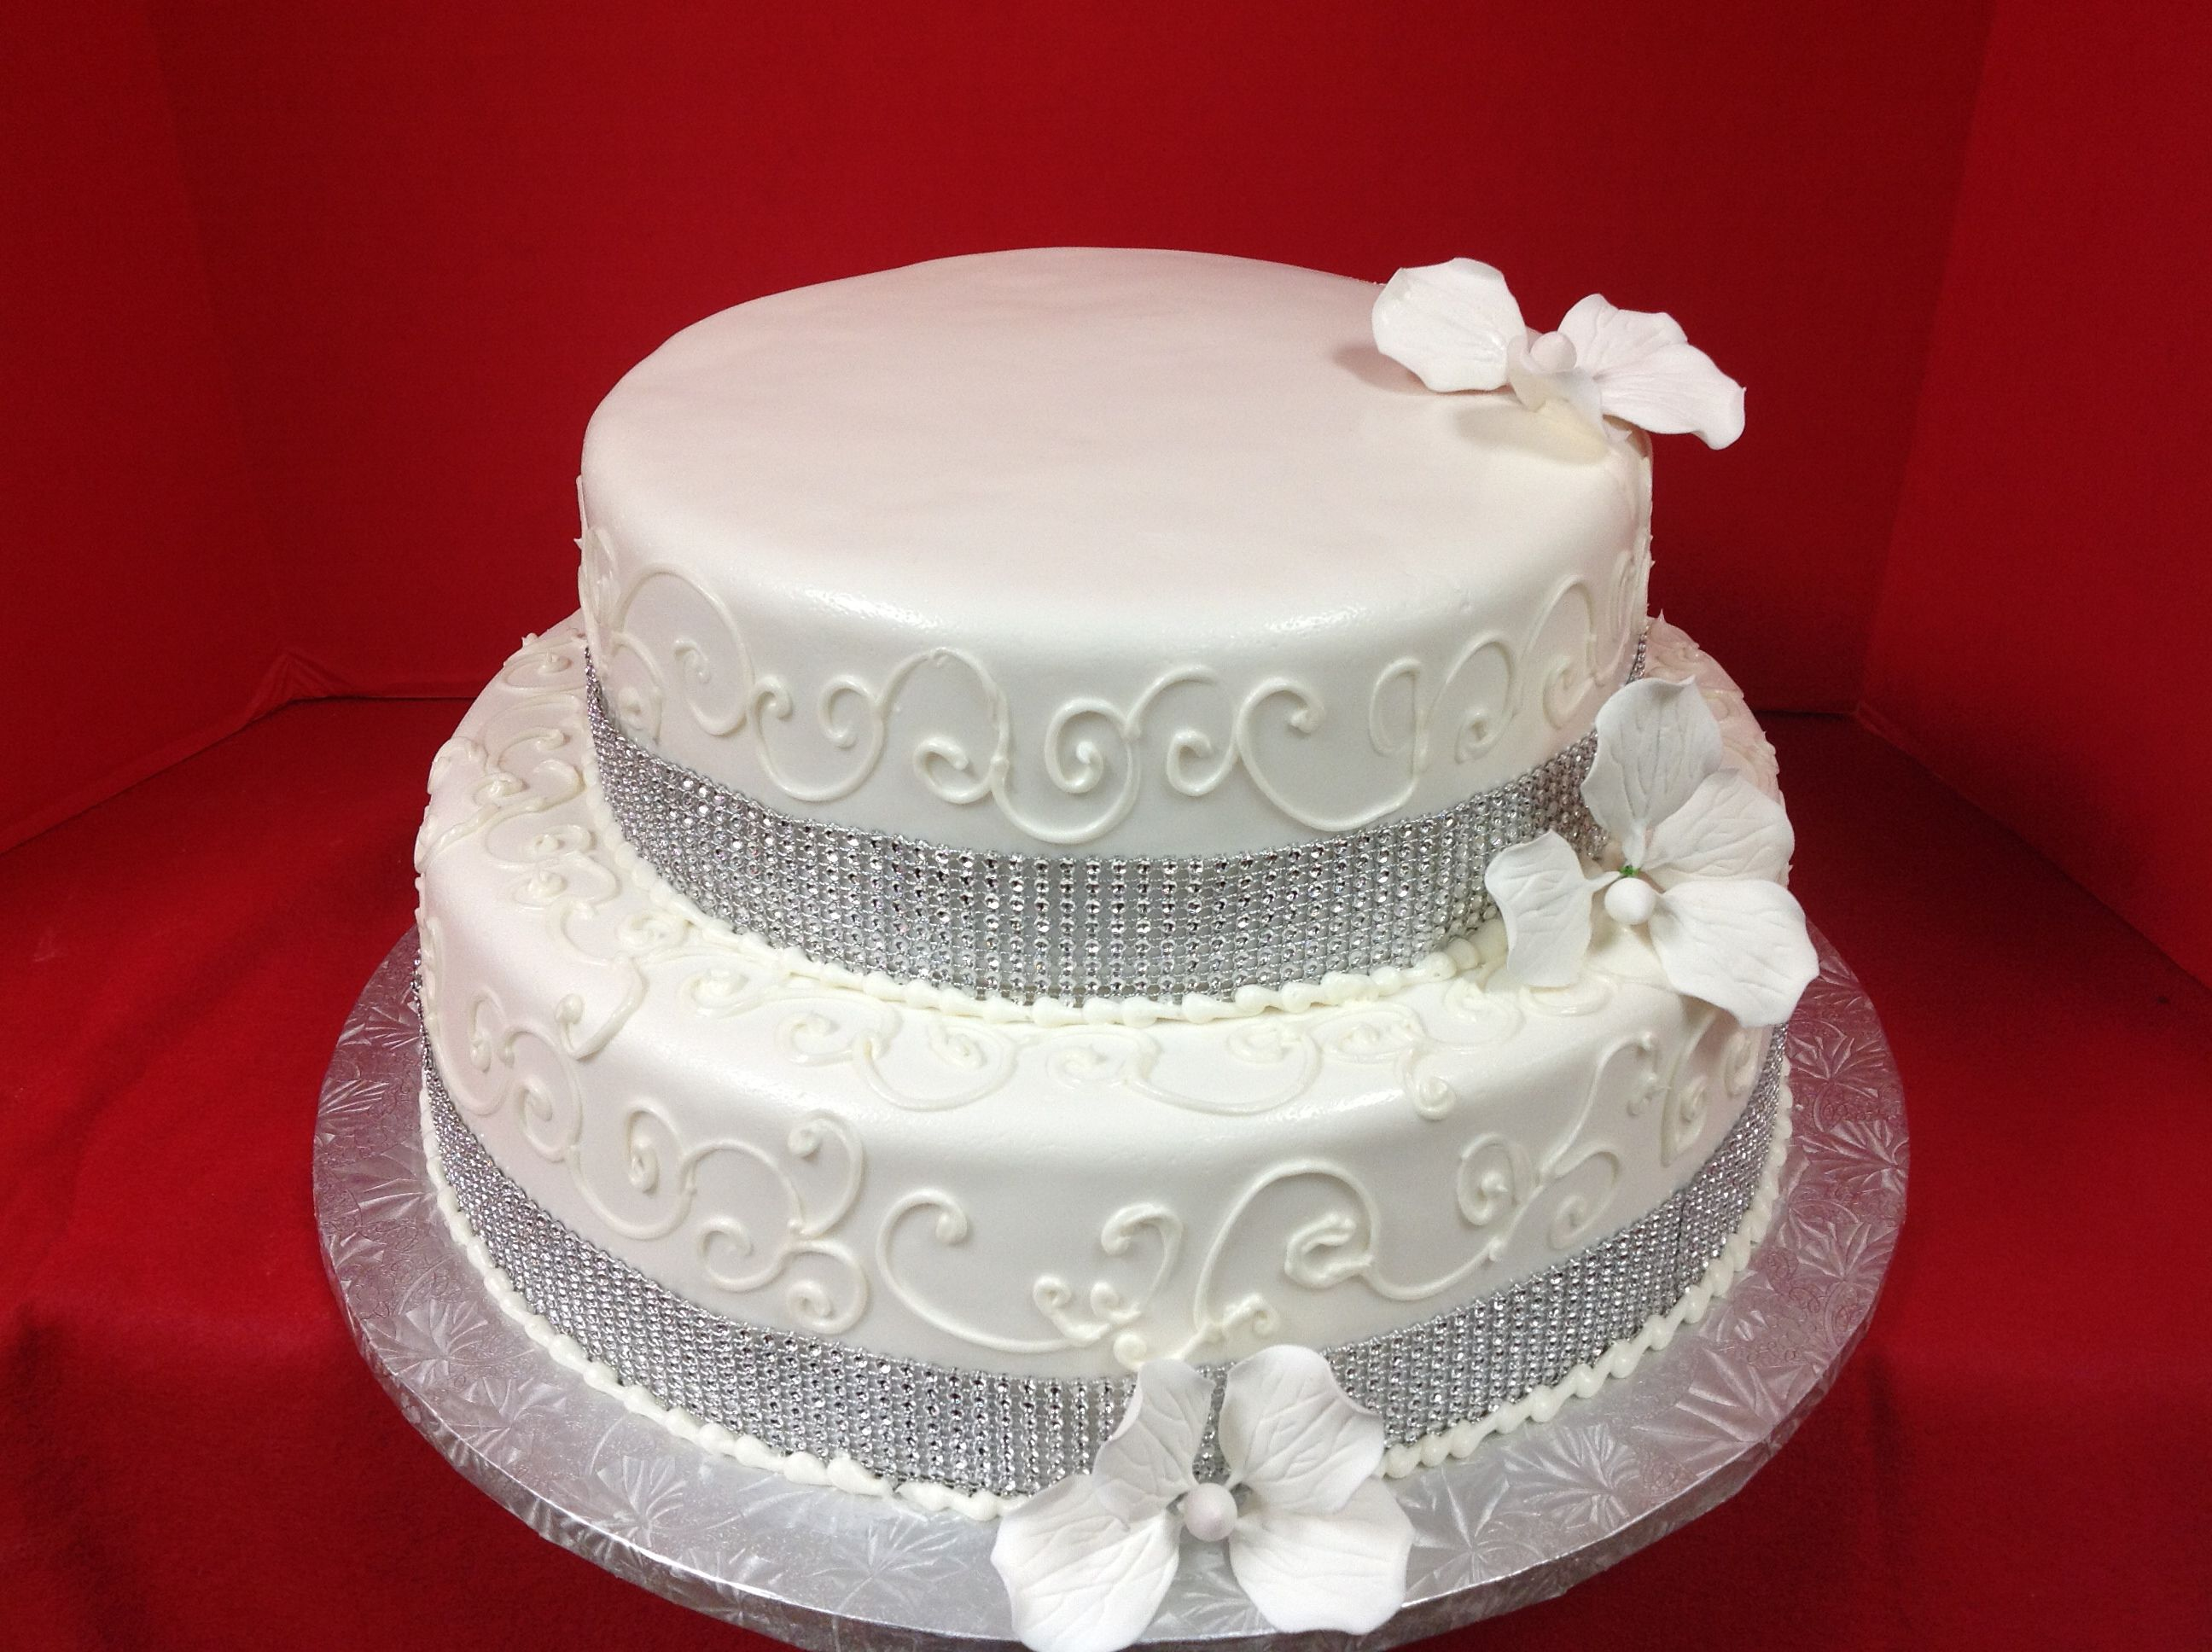 Cake Recipes In Pdf: 2014 Wilton Yearbook Cake Decorating By Pdf Free Download